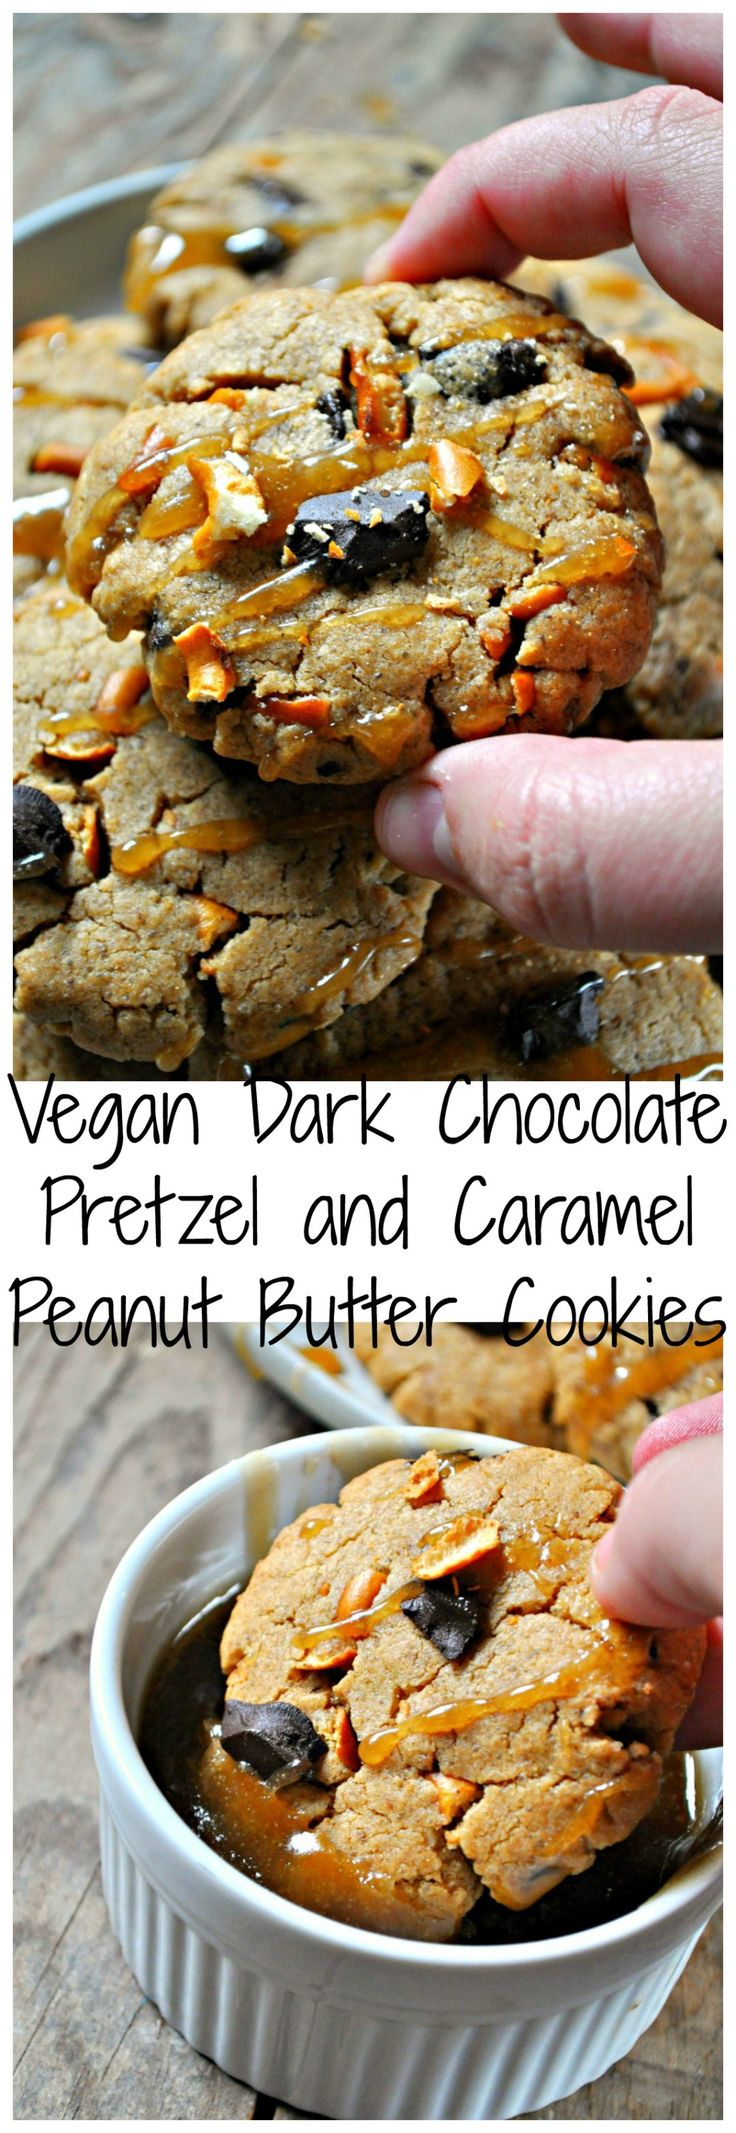 Vegan Dark Chocolate Pretzel and Caramel Peanut Butter Cookies